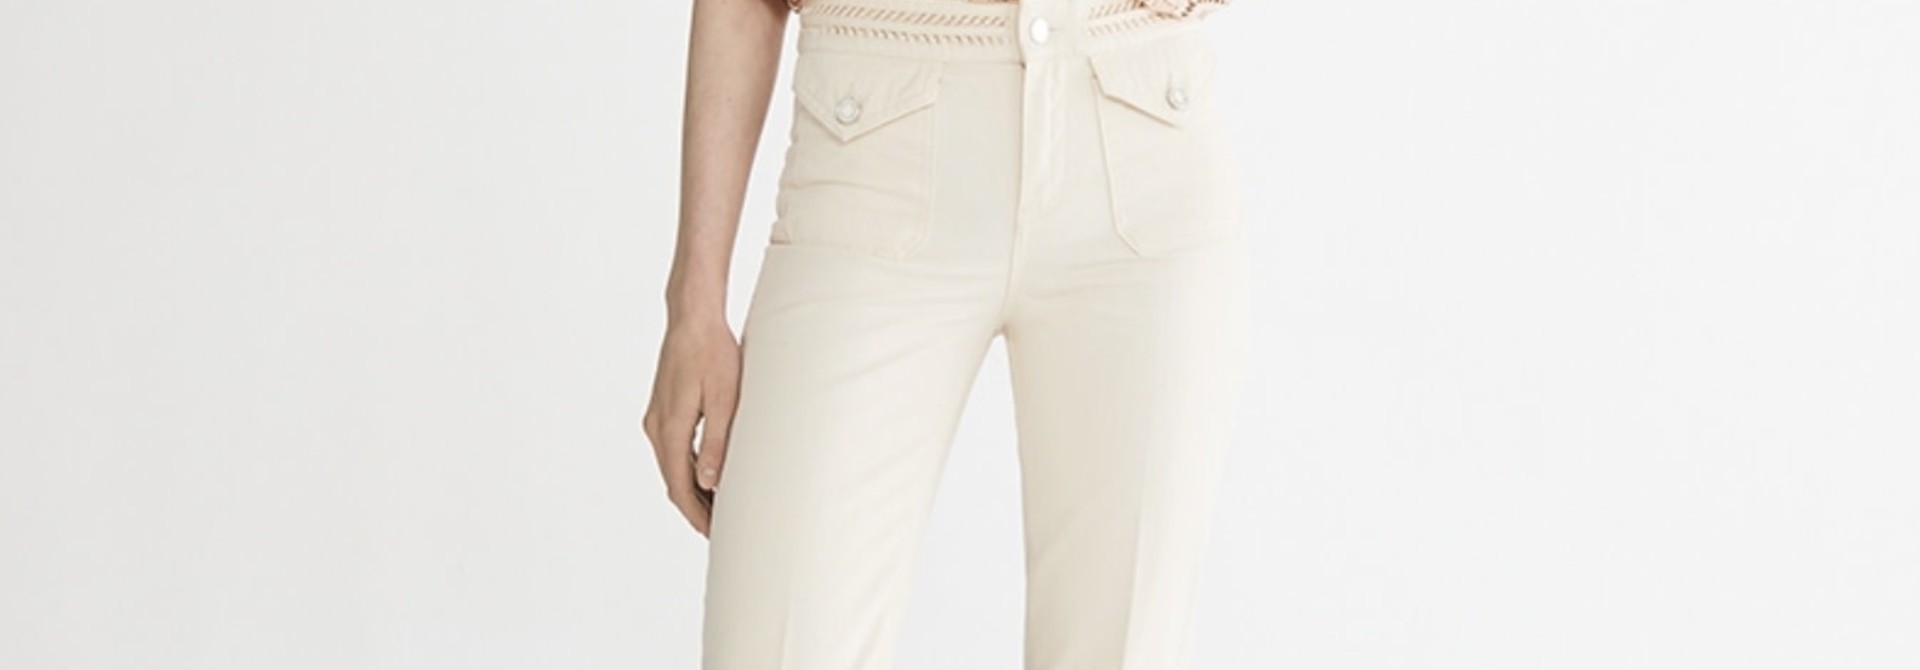 Lowell blouse Vanessa Bruno